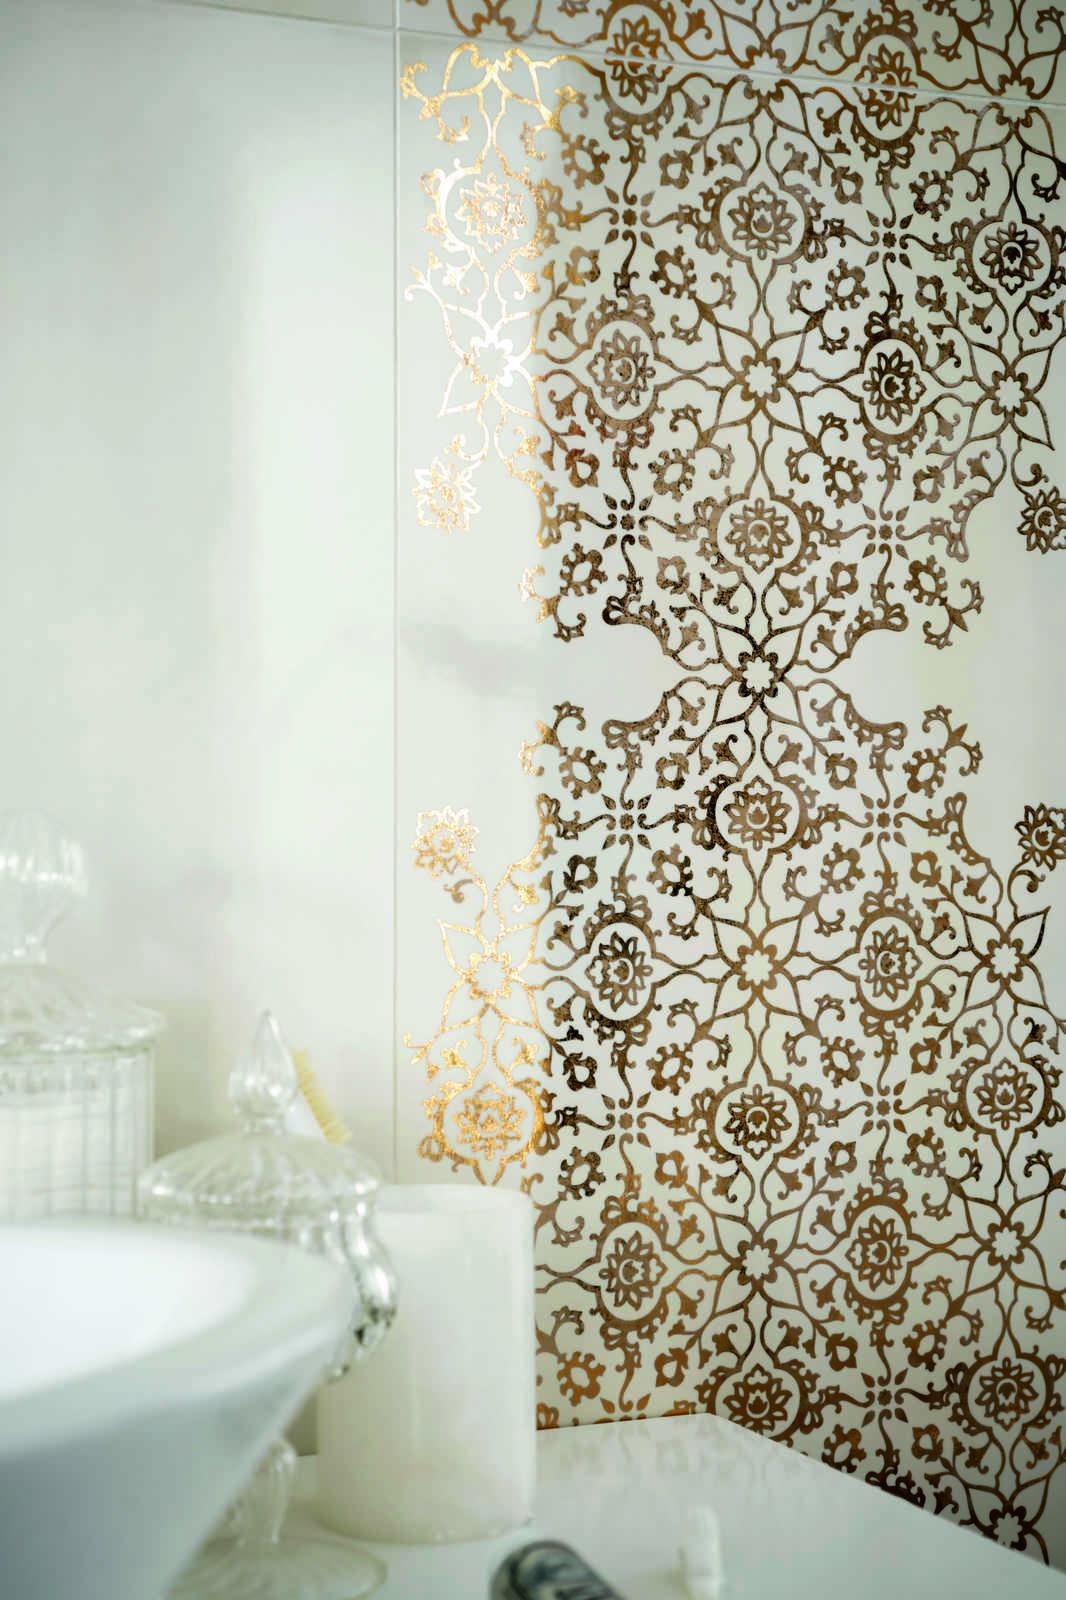 Gold Bathroom Tiles Uk gold bathroom tiles uk can intended design decorating